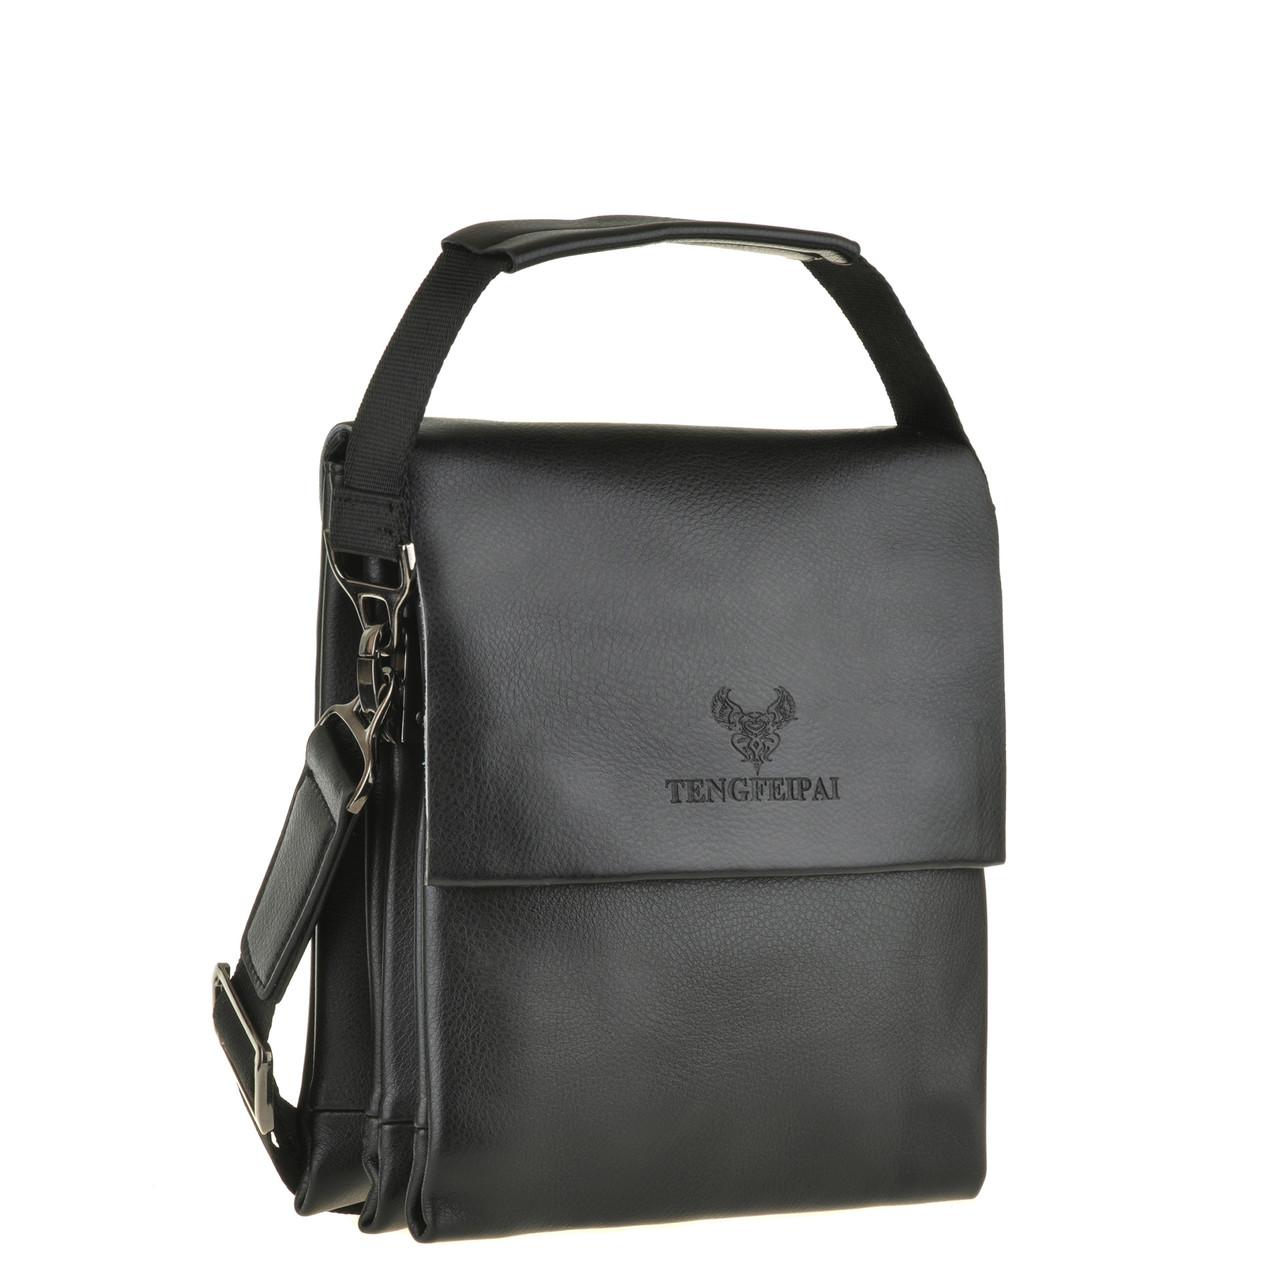 Мужская сумка вертикальная TENGFEIPAI кожаная 22х25х9  ксА6001-2